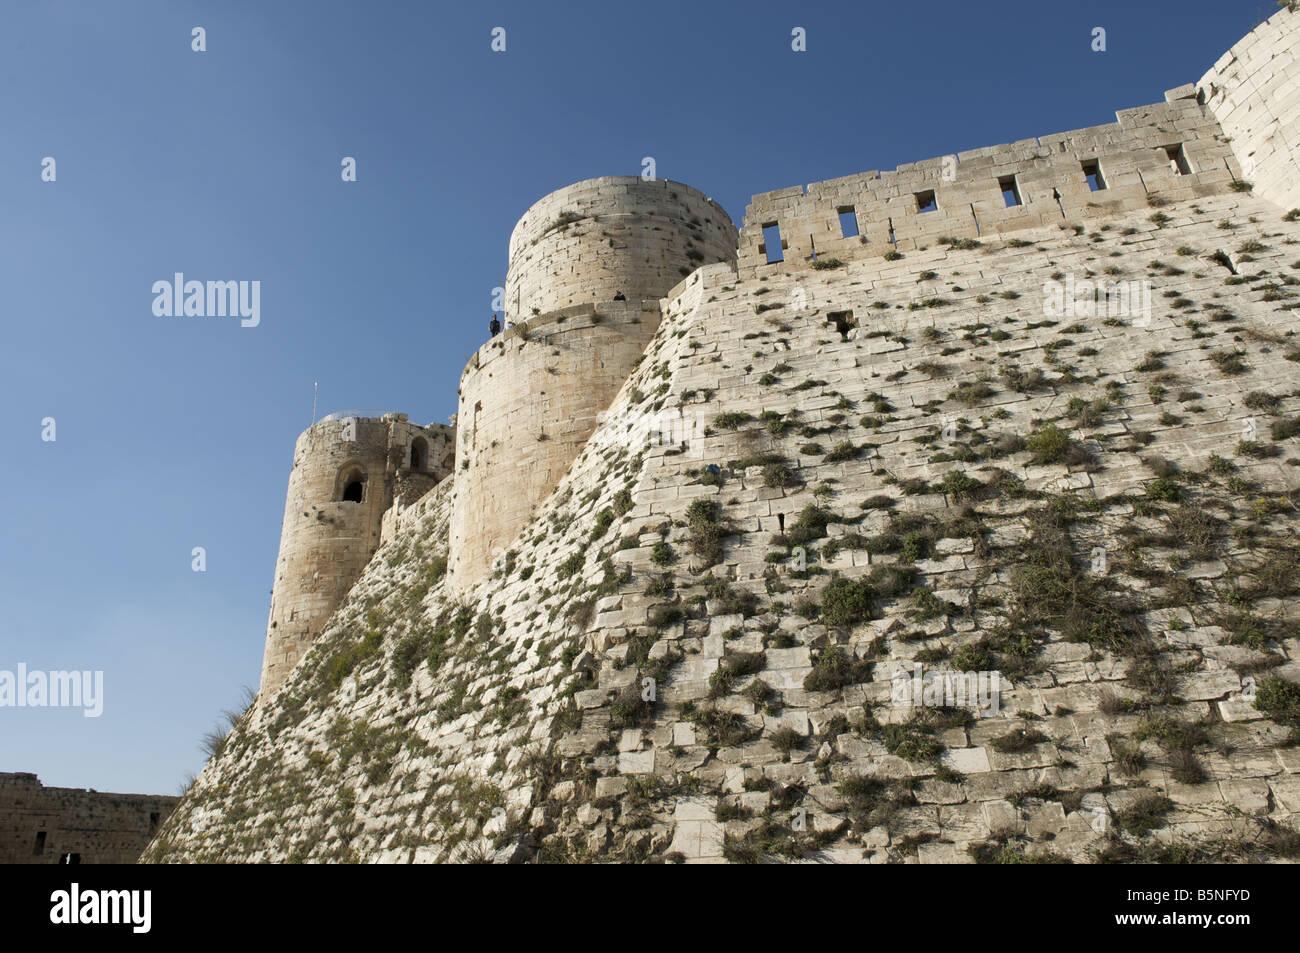 Krak Des Chevaliers, Qalaat Al Hosn, Crusader castle, Syria. - Stock Image